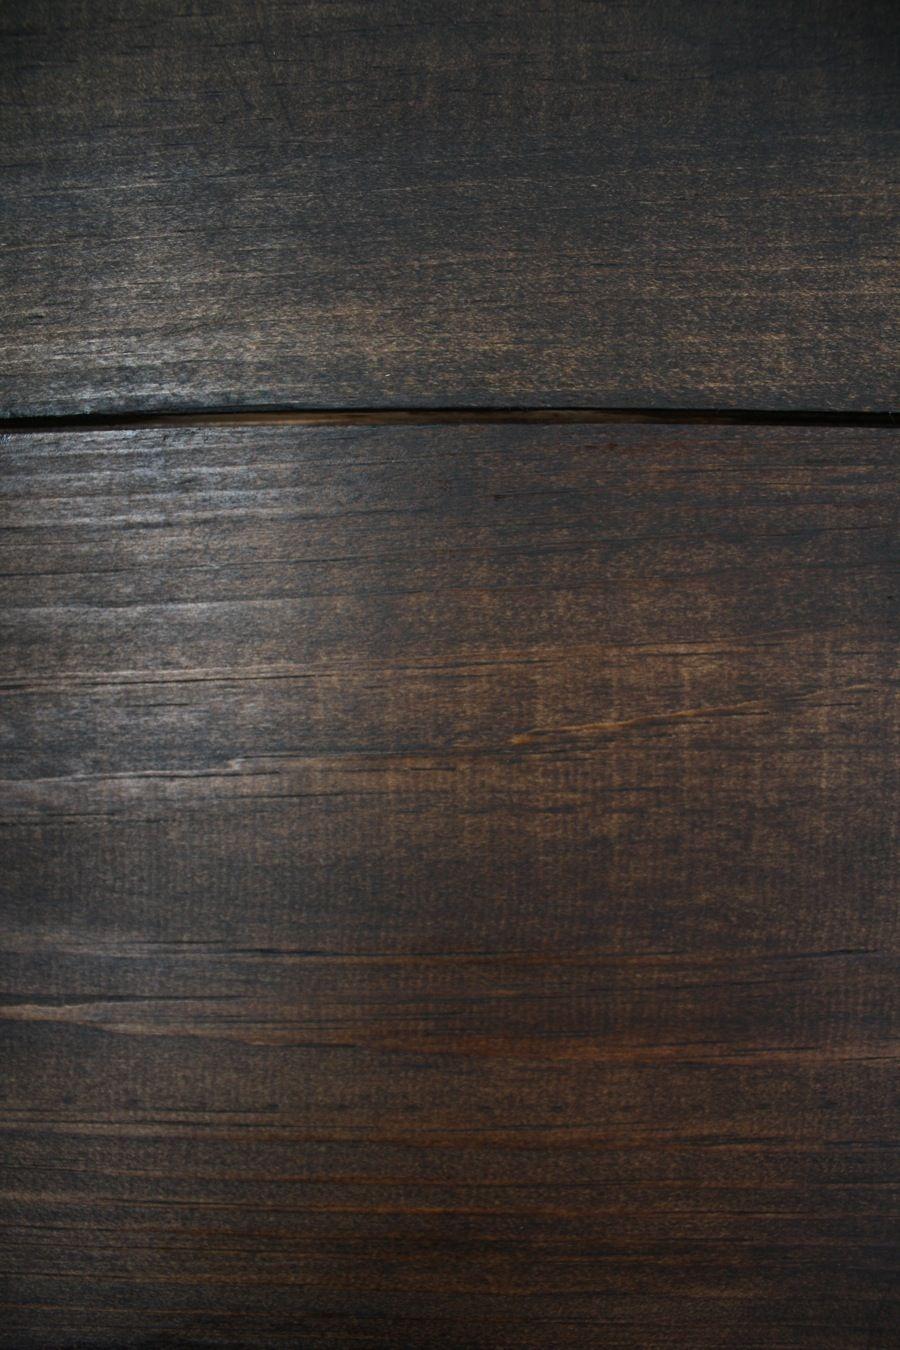 Adding a coat of jacobean minwax stain over the dark walnut left